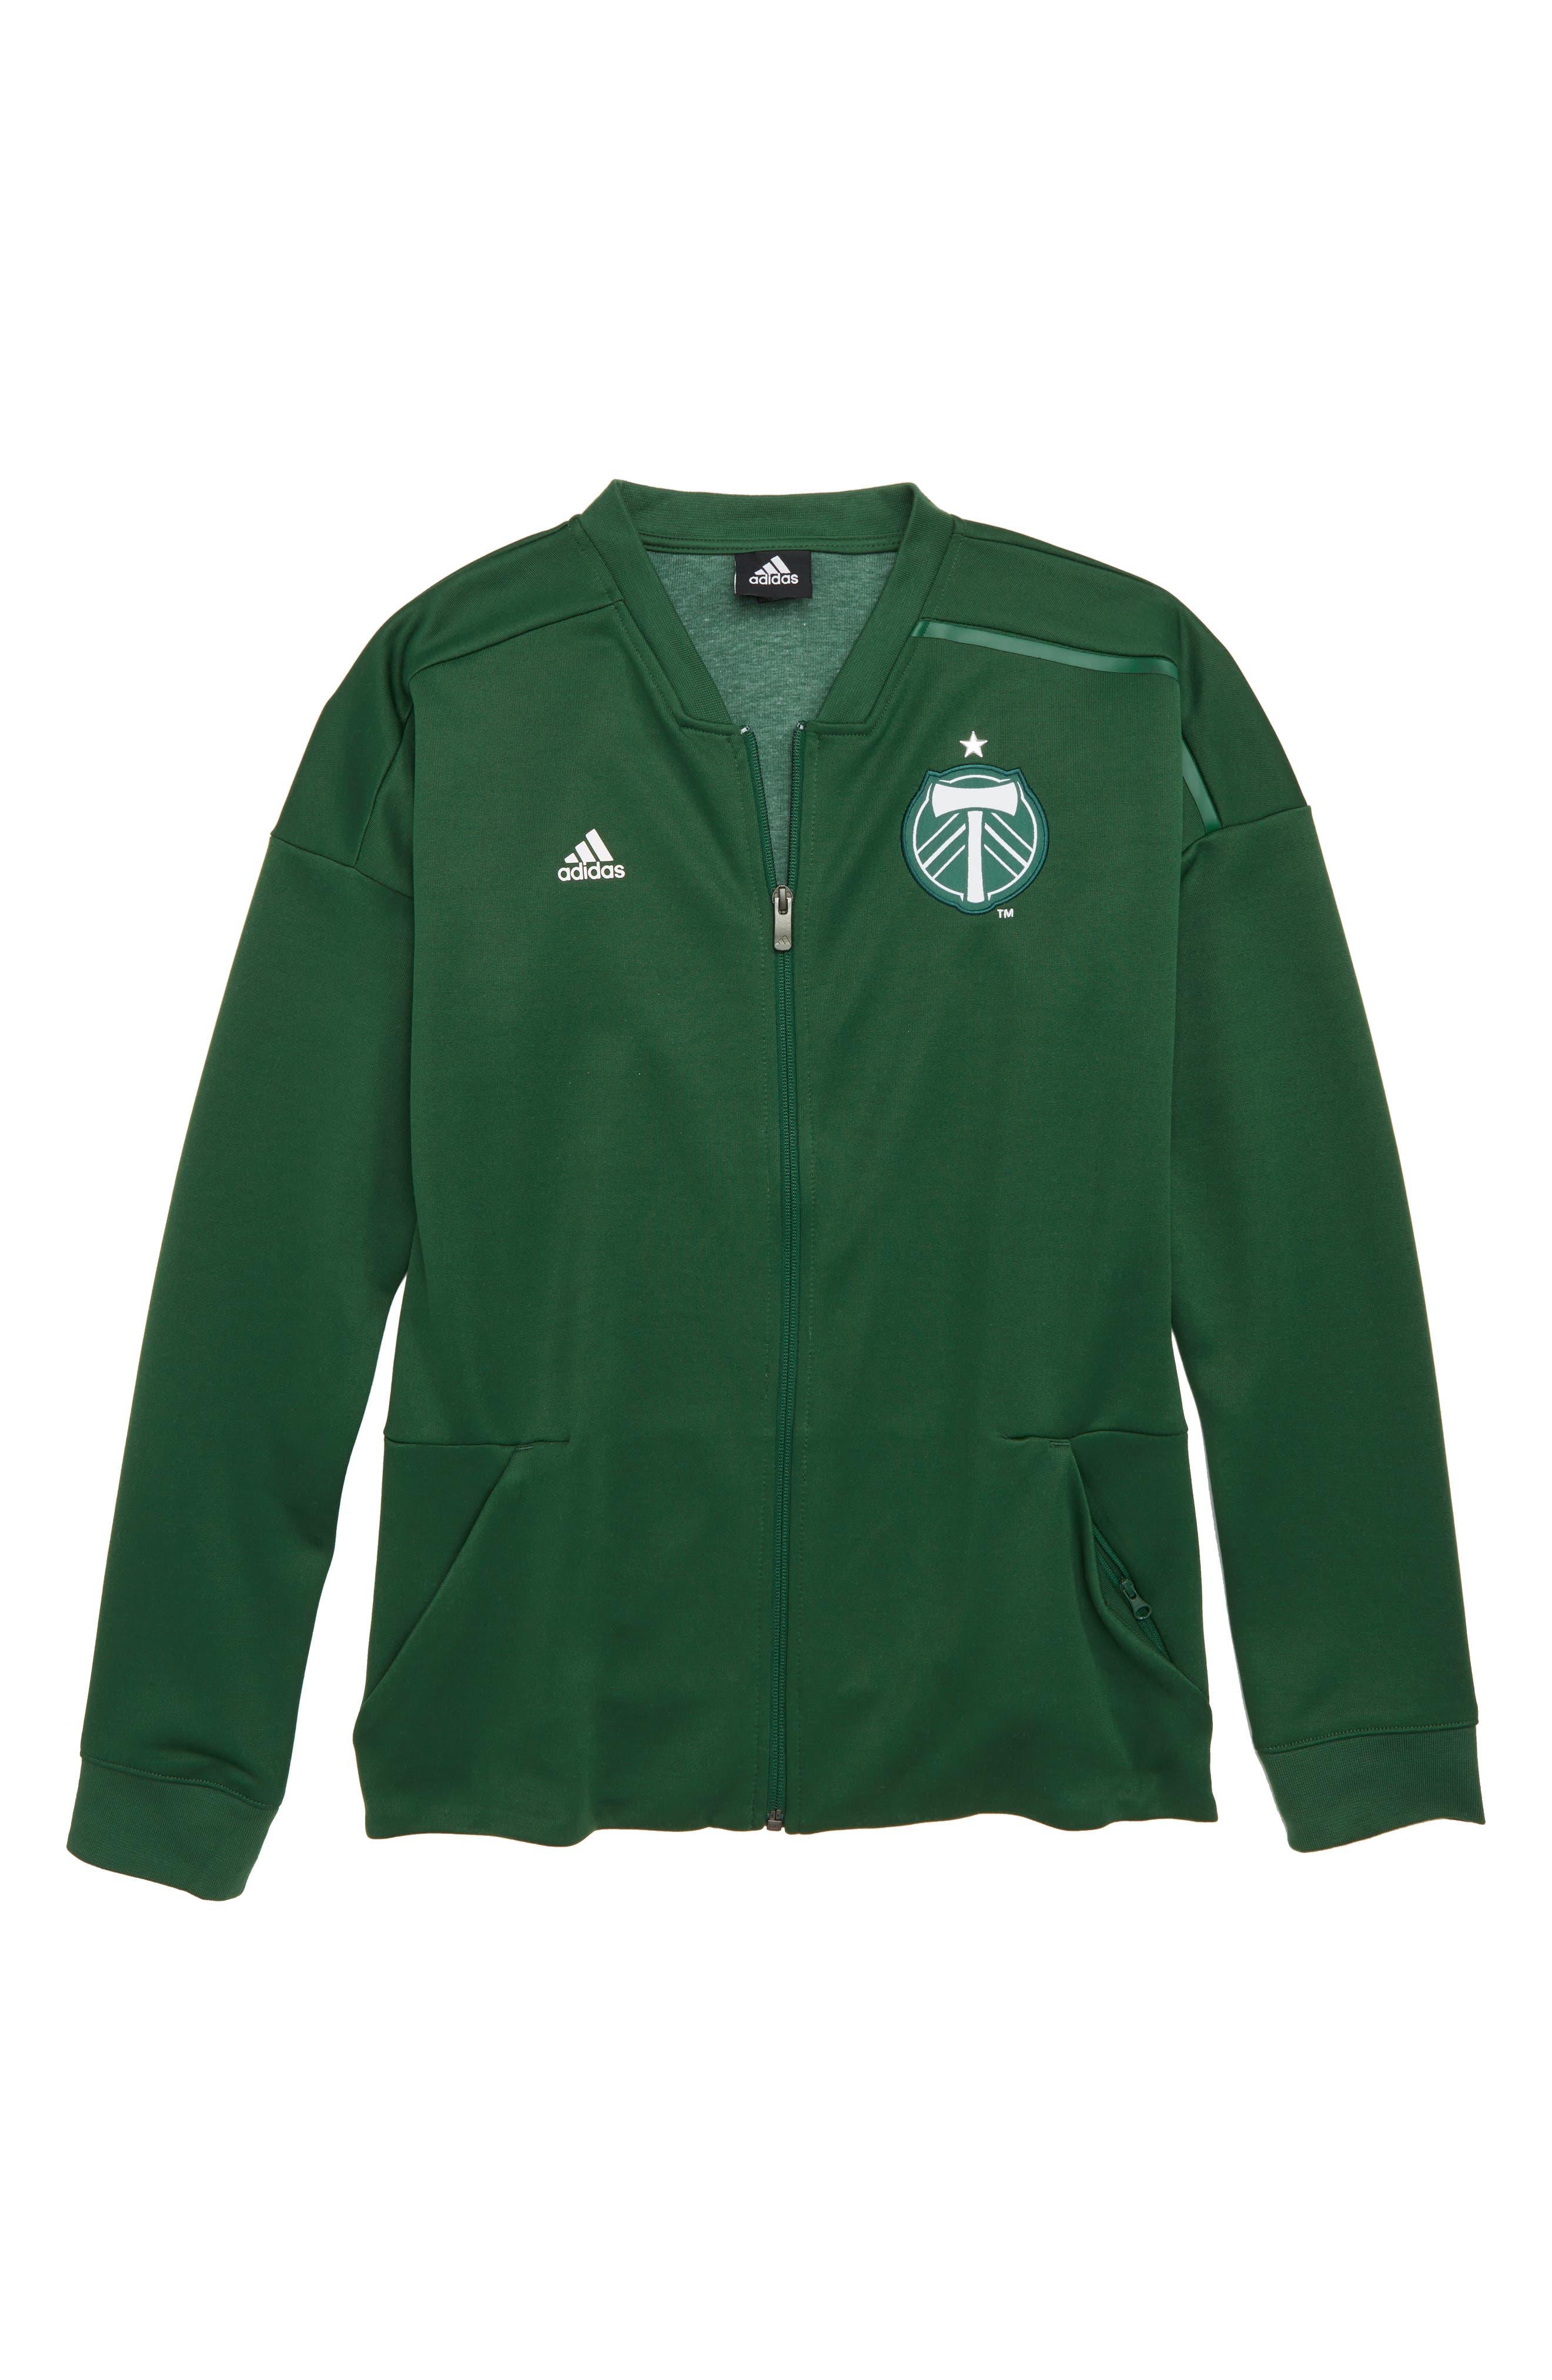 MLS Portland Timbers Anthem Full Zip Jacket,                         Main,                         color, 300